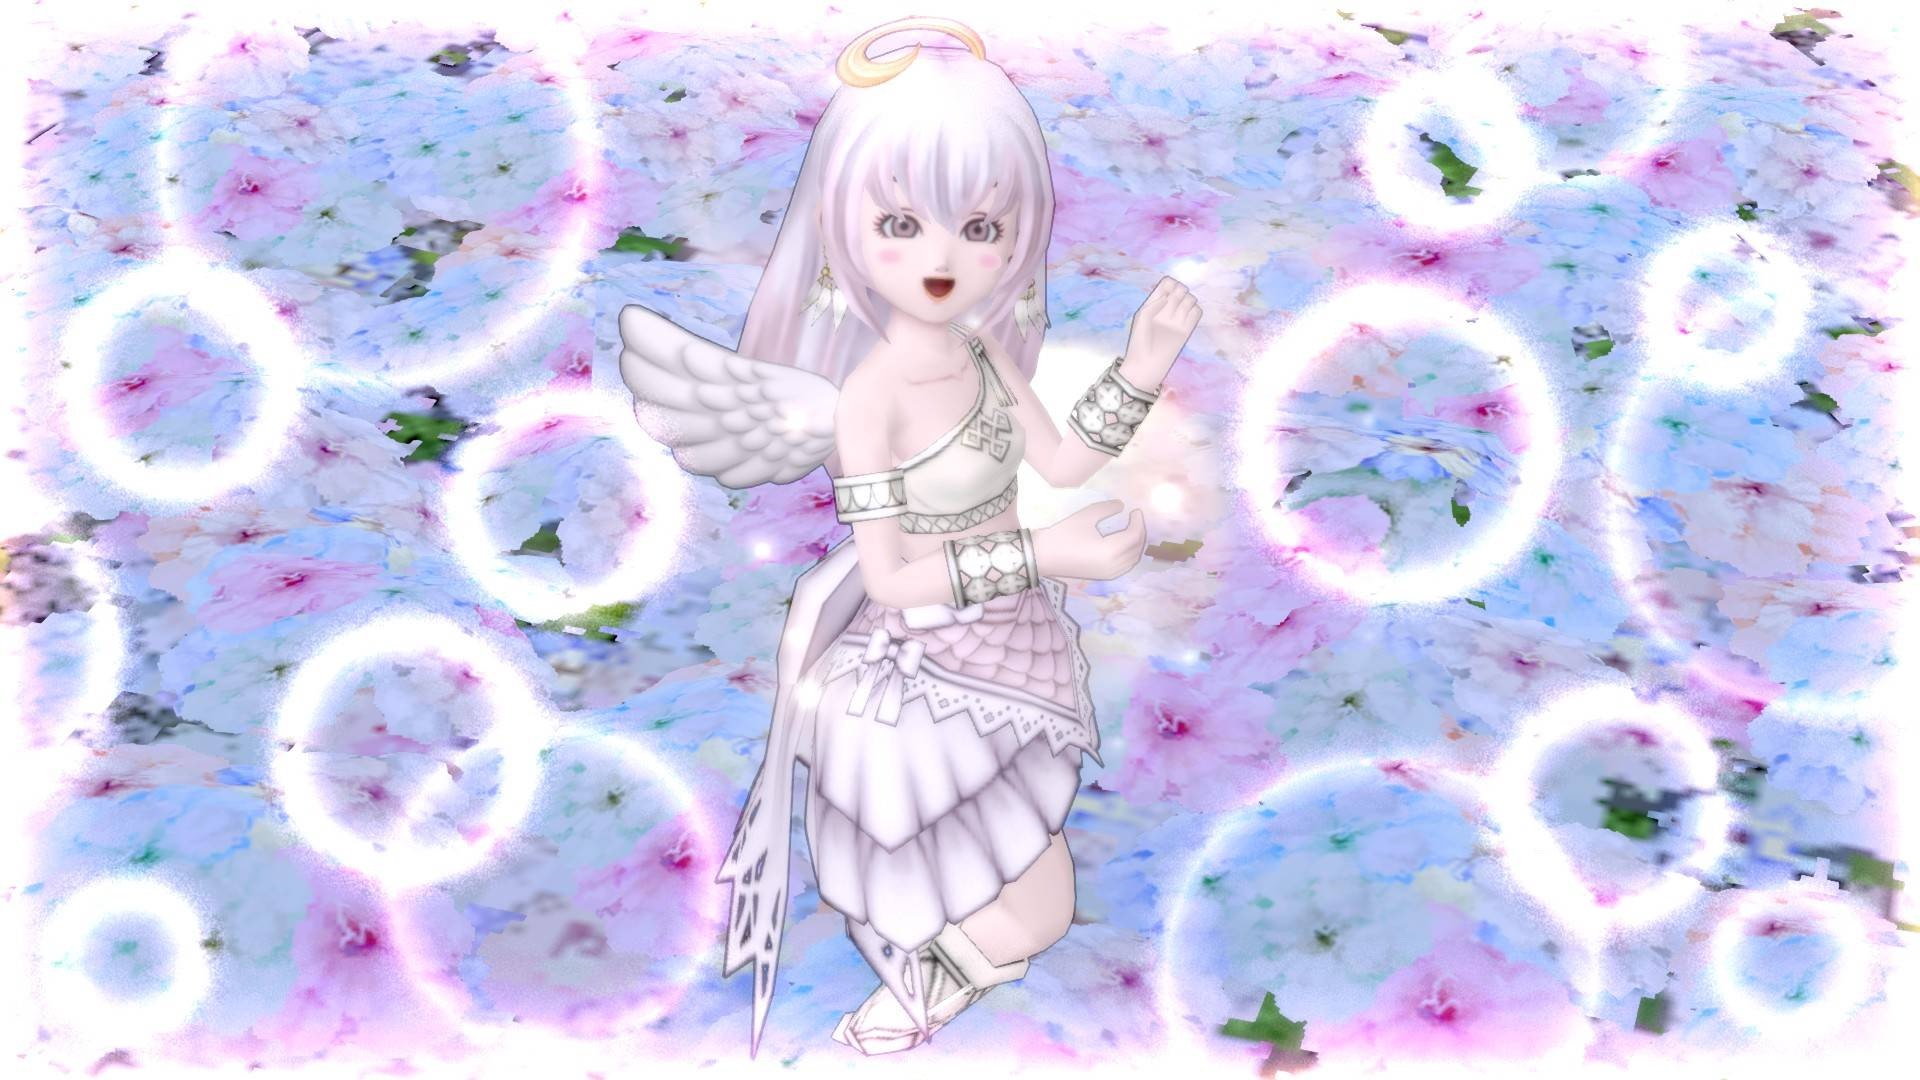 f:id:LunaMerrick:20210118113314j:plain